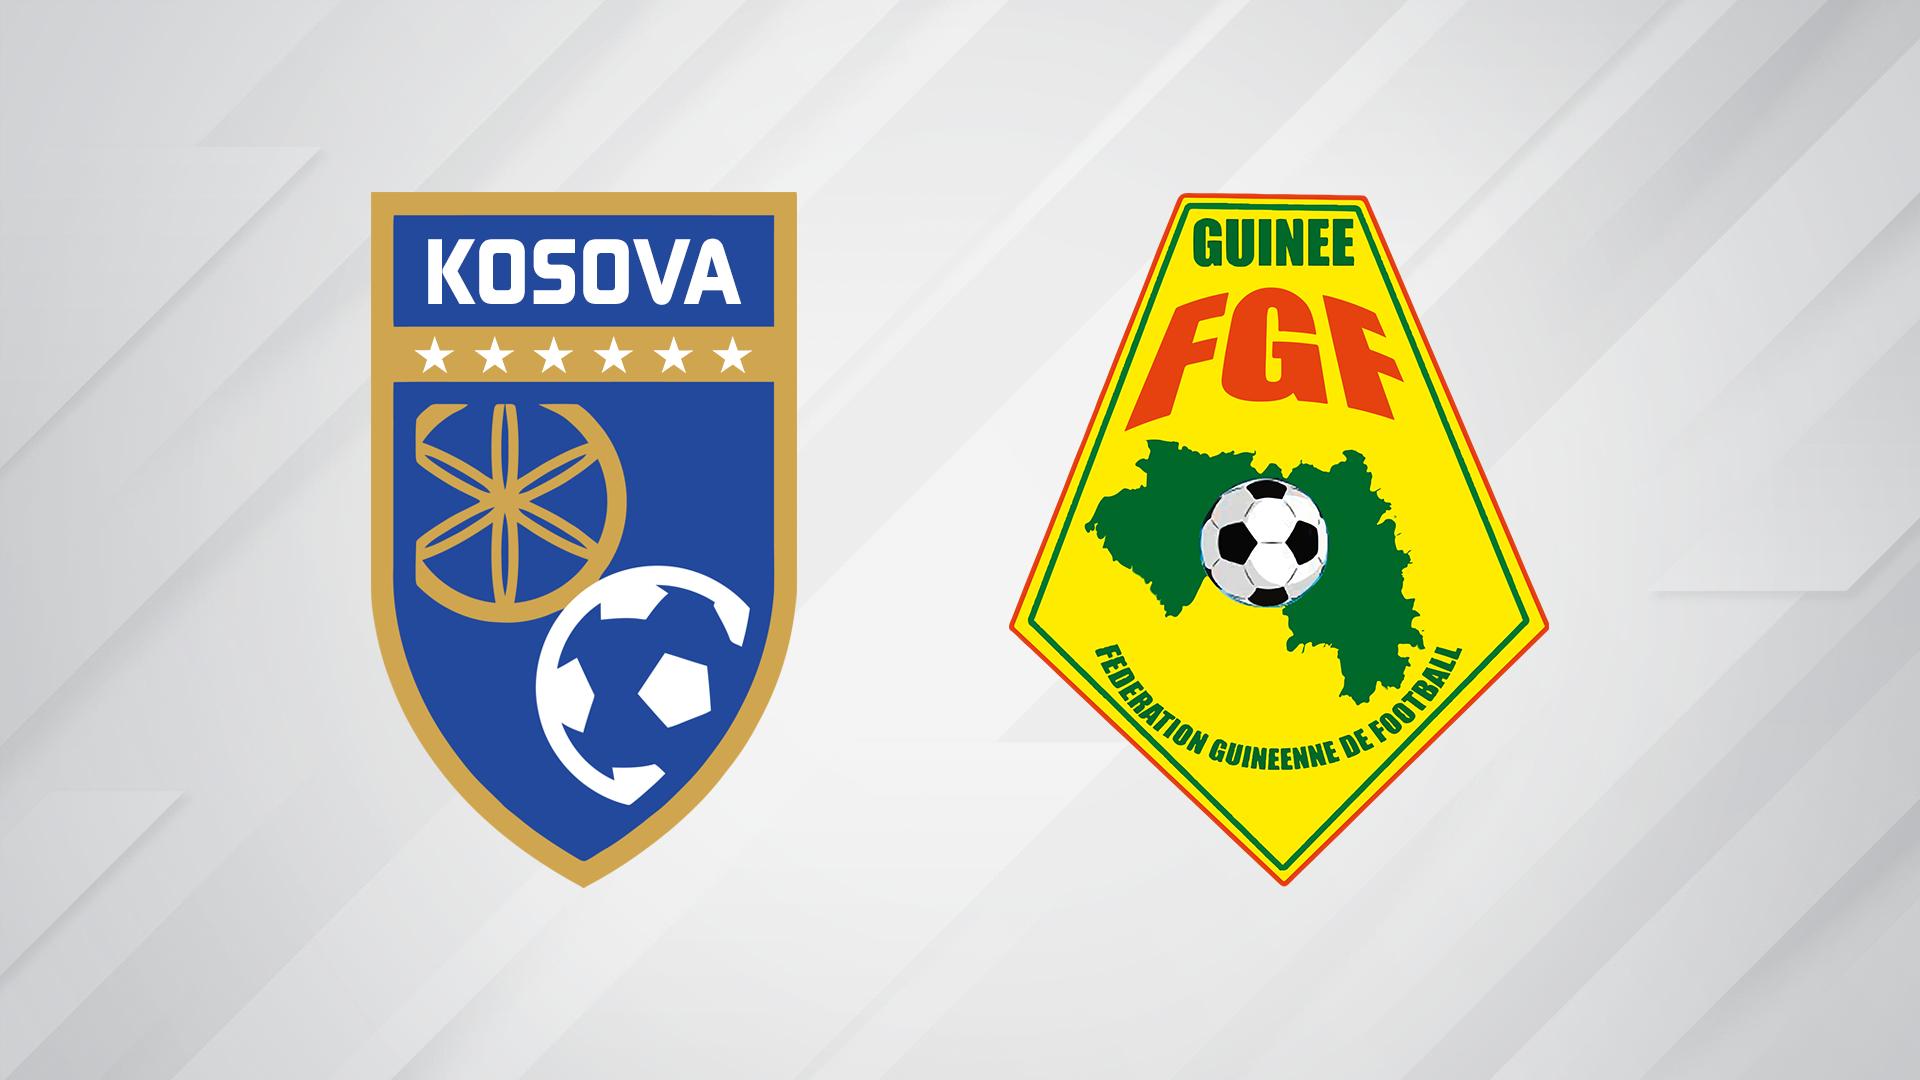 Kosova mposhtet nga Guinea